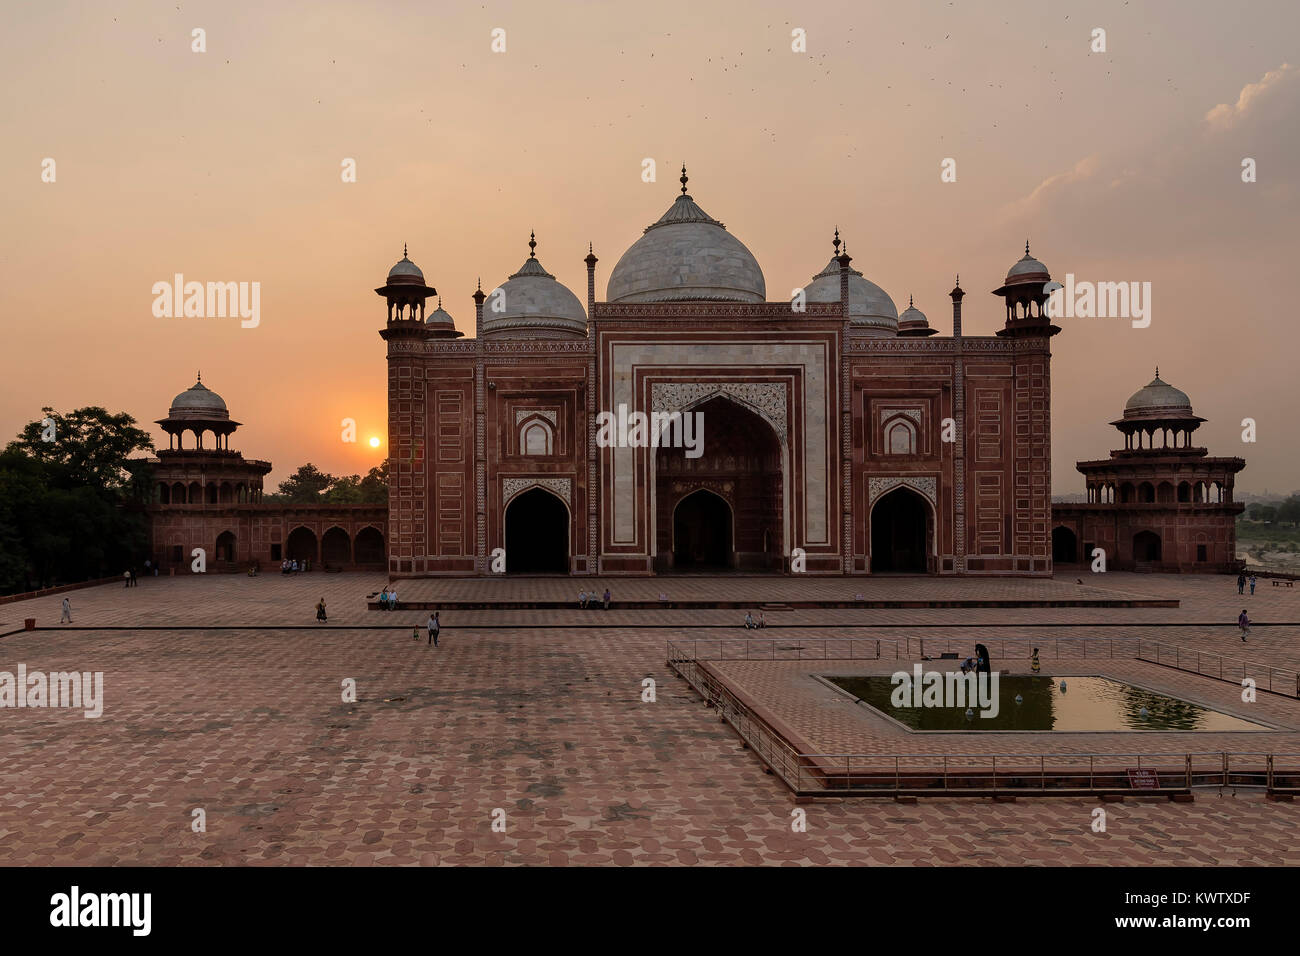 Die Fe Verbot Moschee gegen Sonnenuntergang, Taj Mahal, Agra, Uttar Pradesh, Indien Stockbild